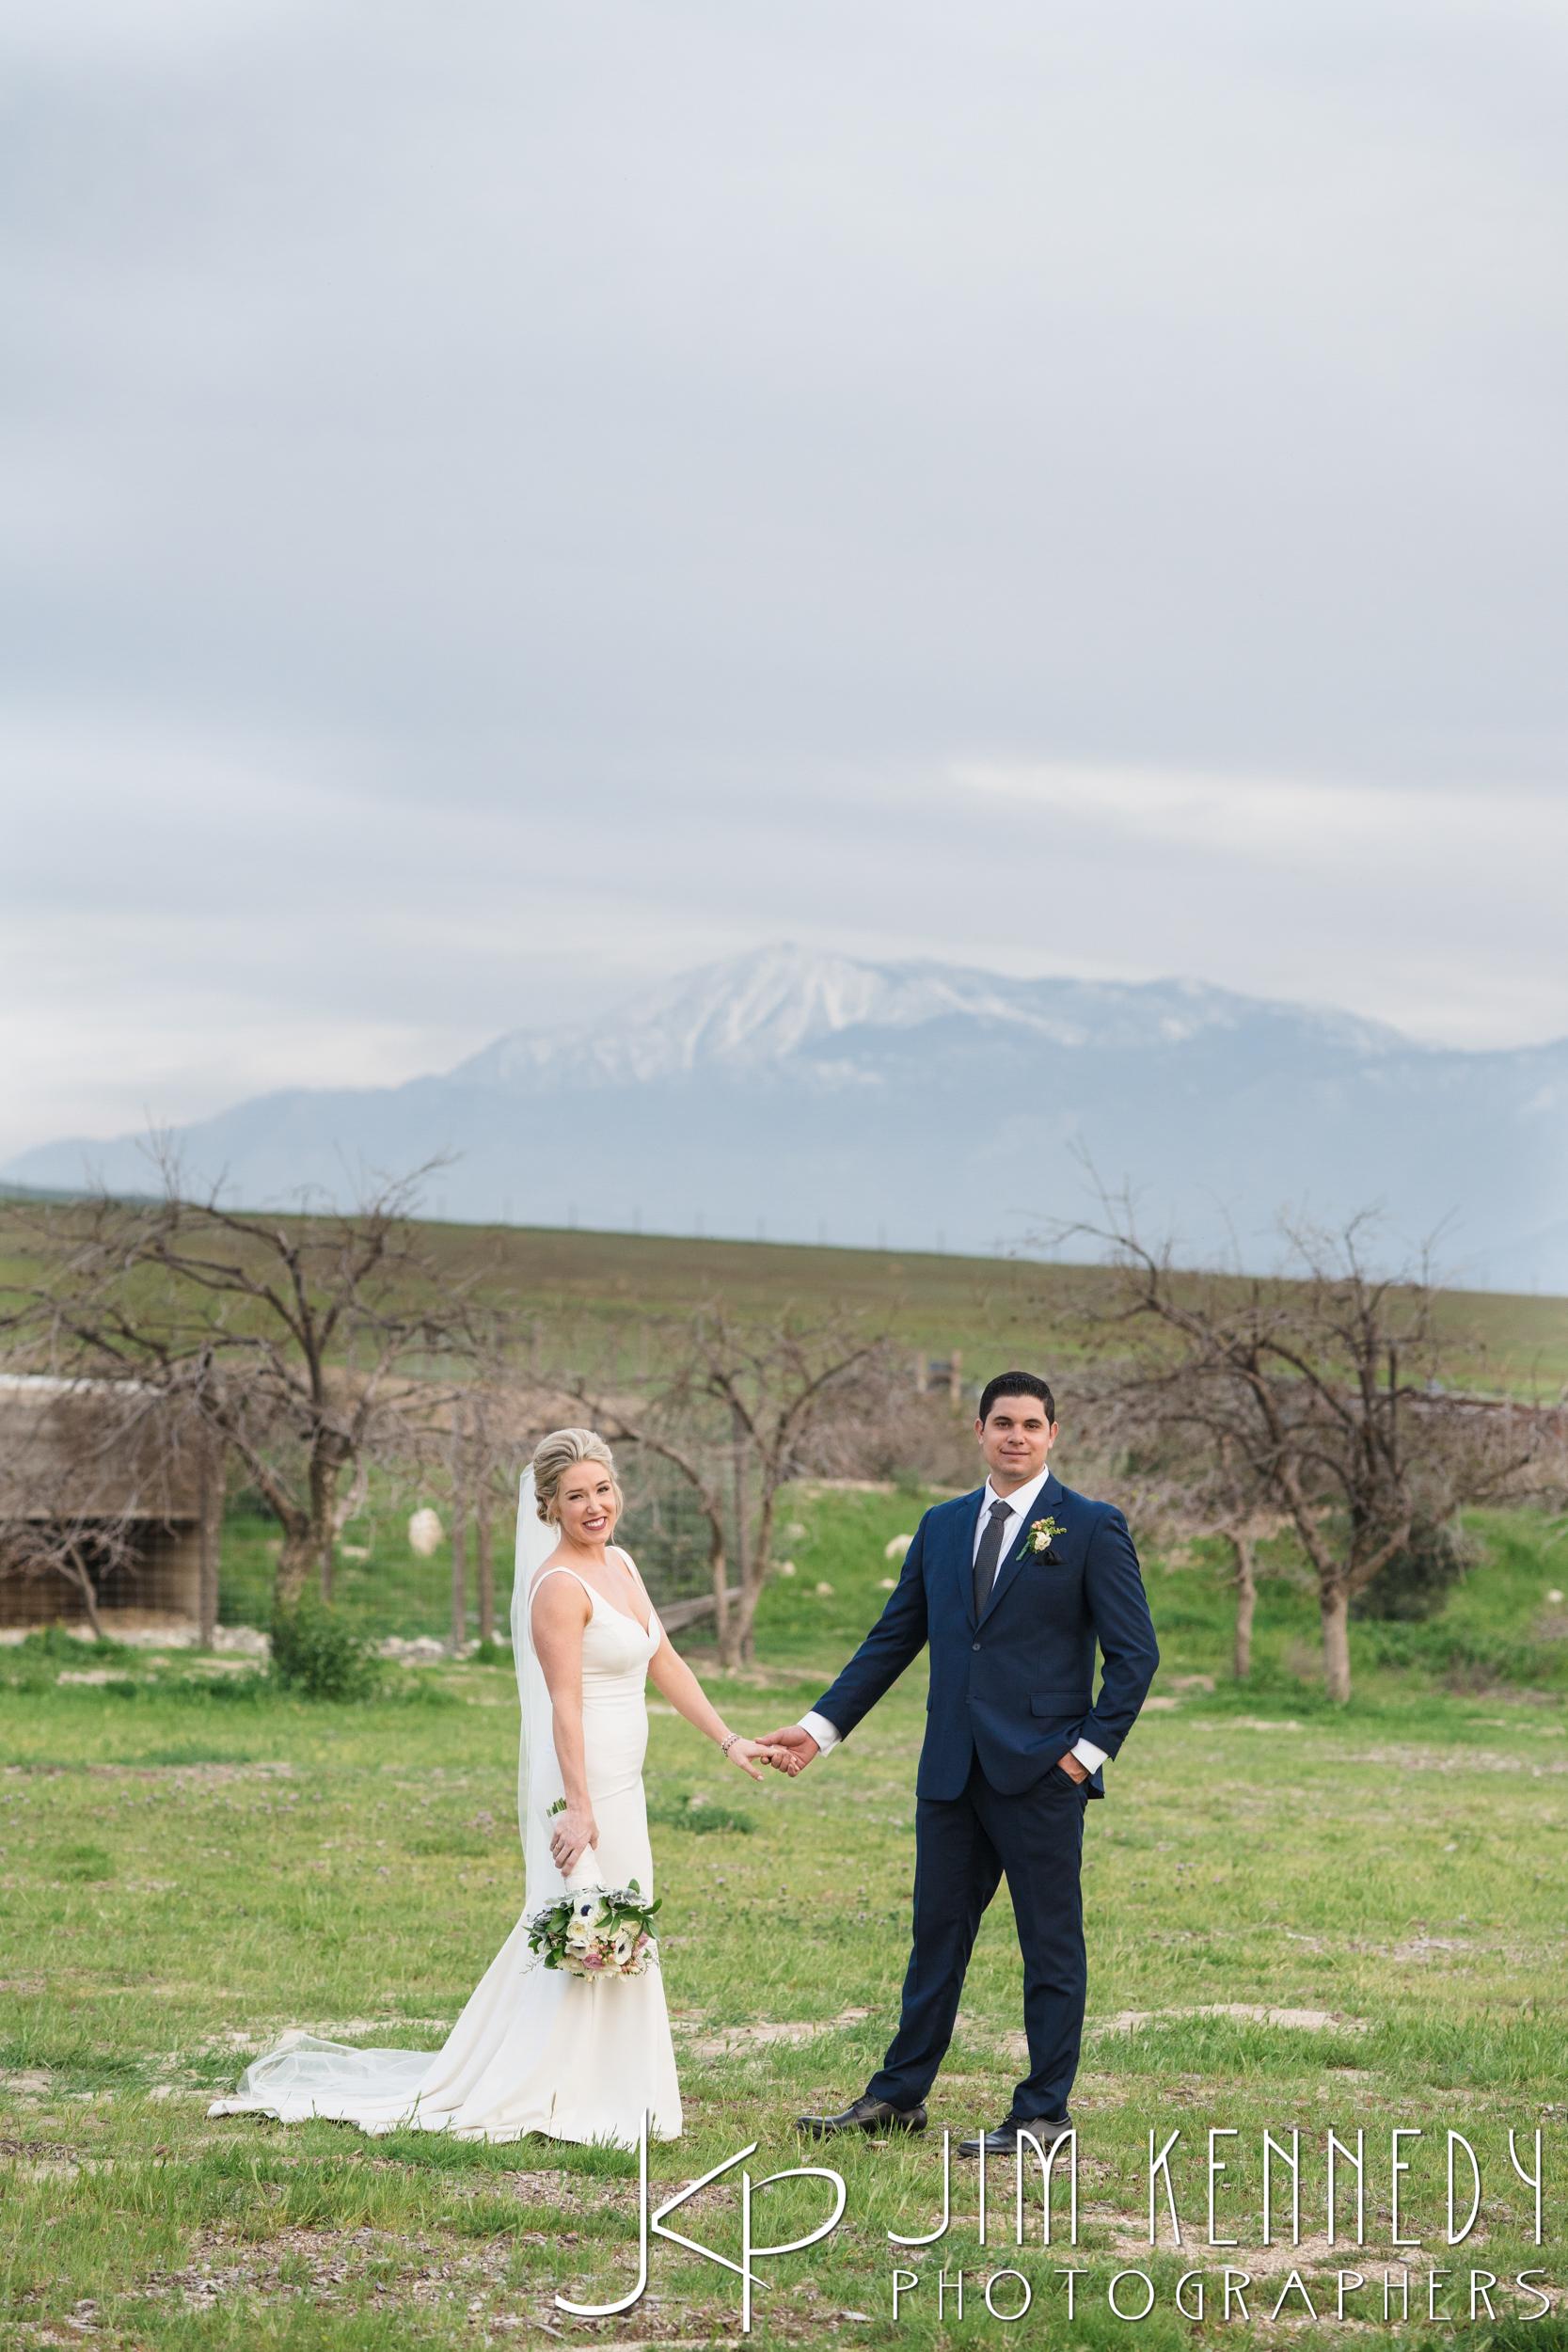 jim_kennedy_photographers_highland_springs_wedding_caitlyn_0141.jpg